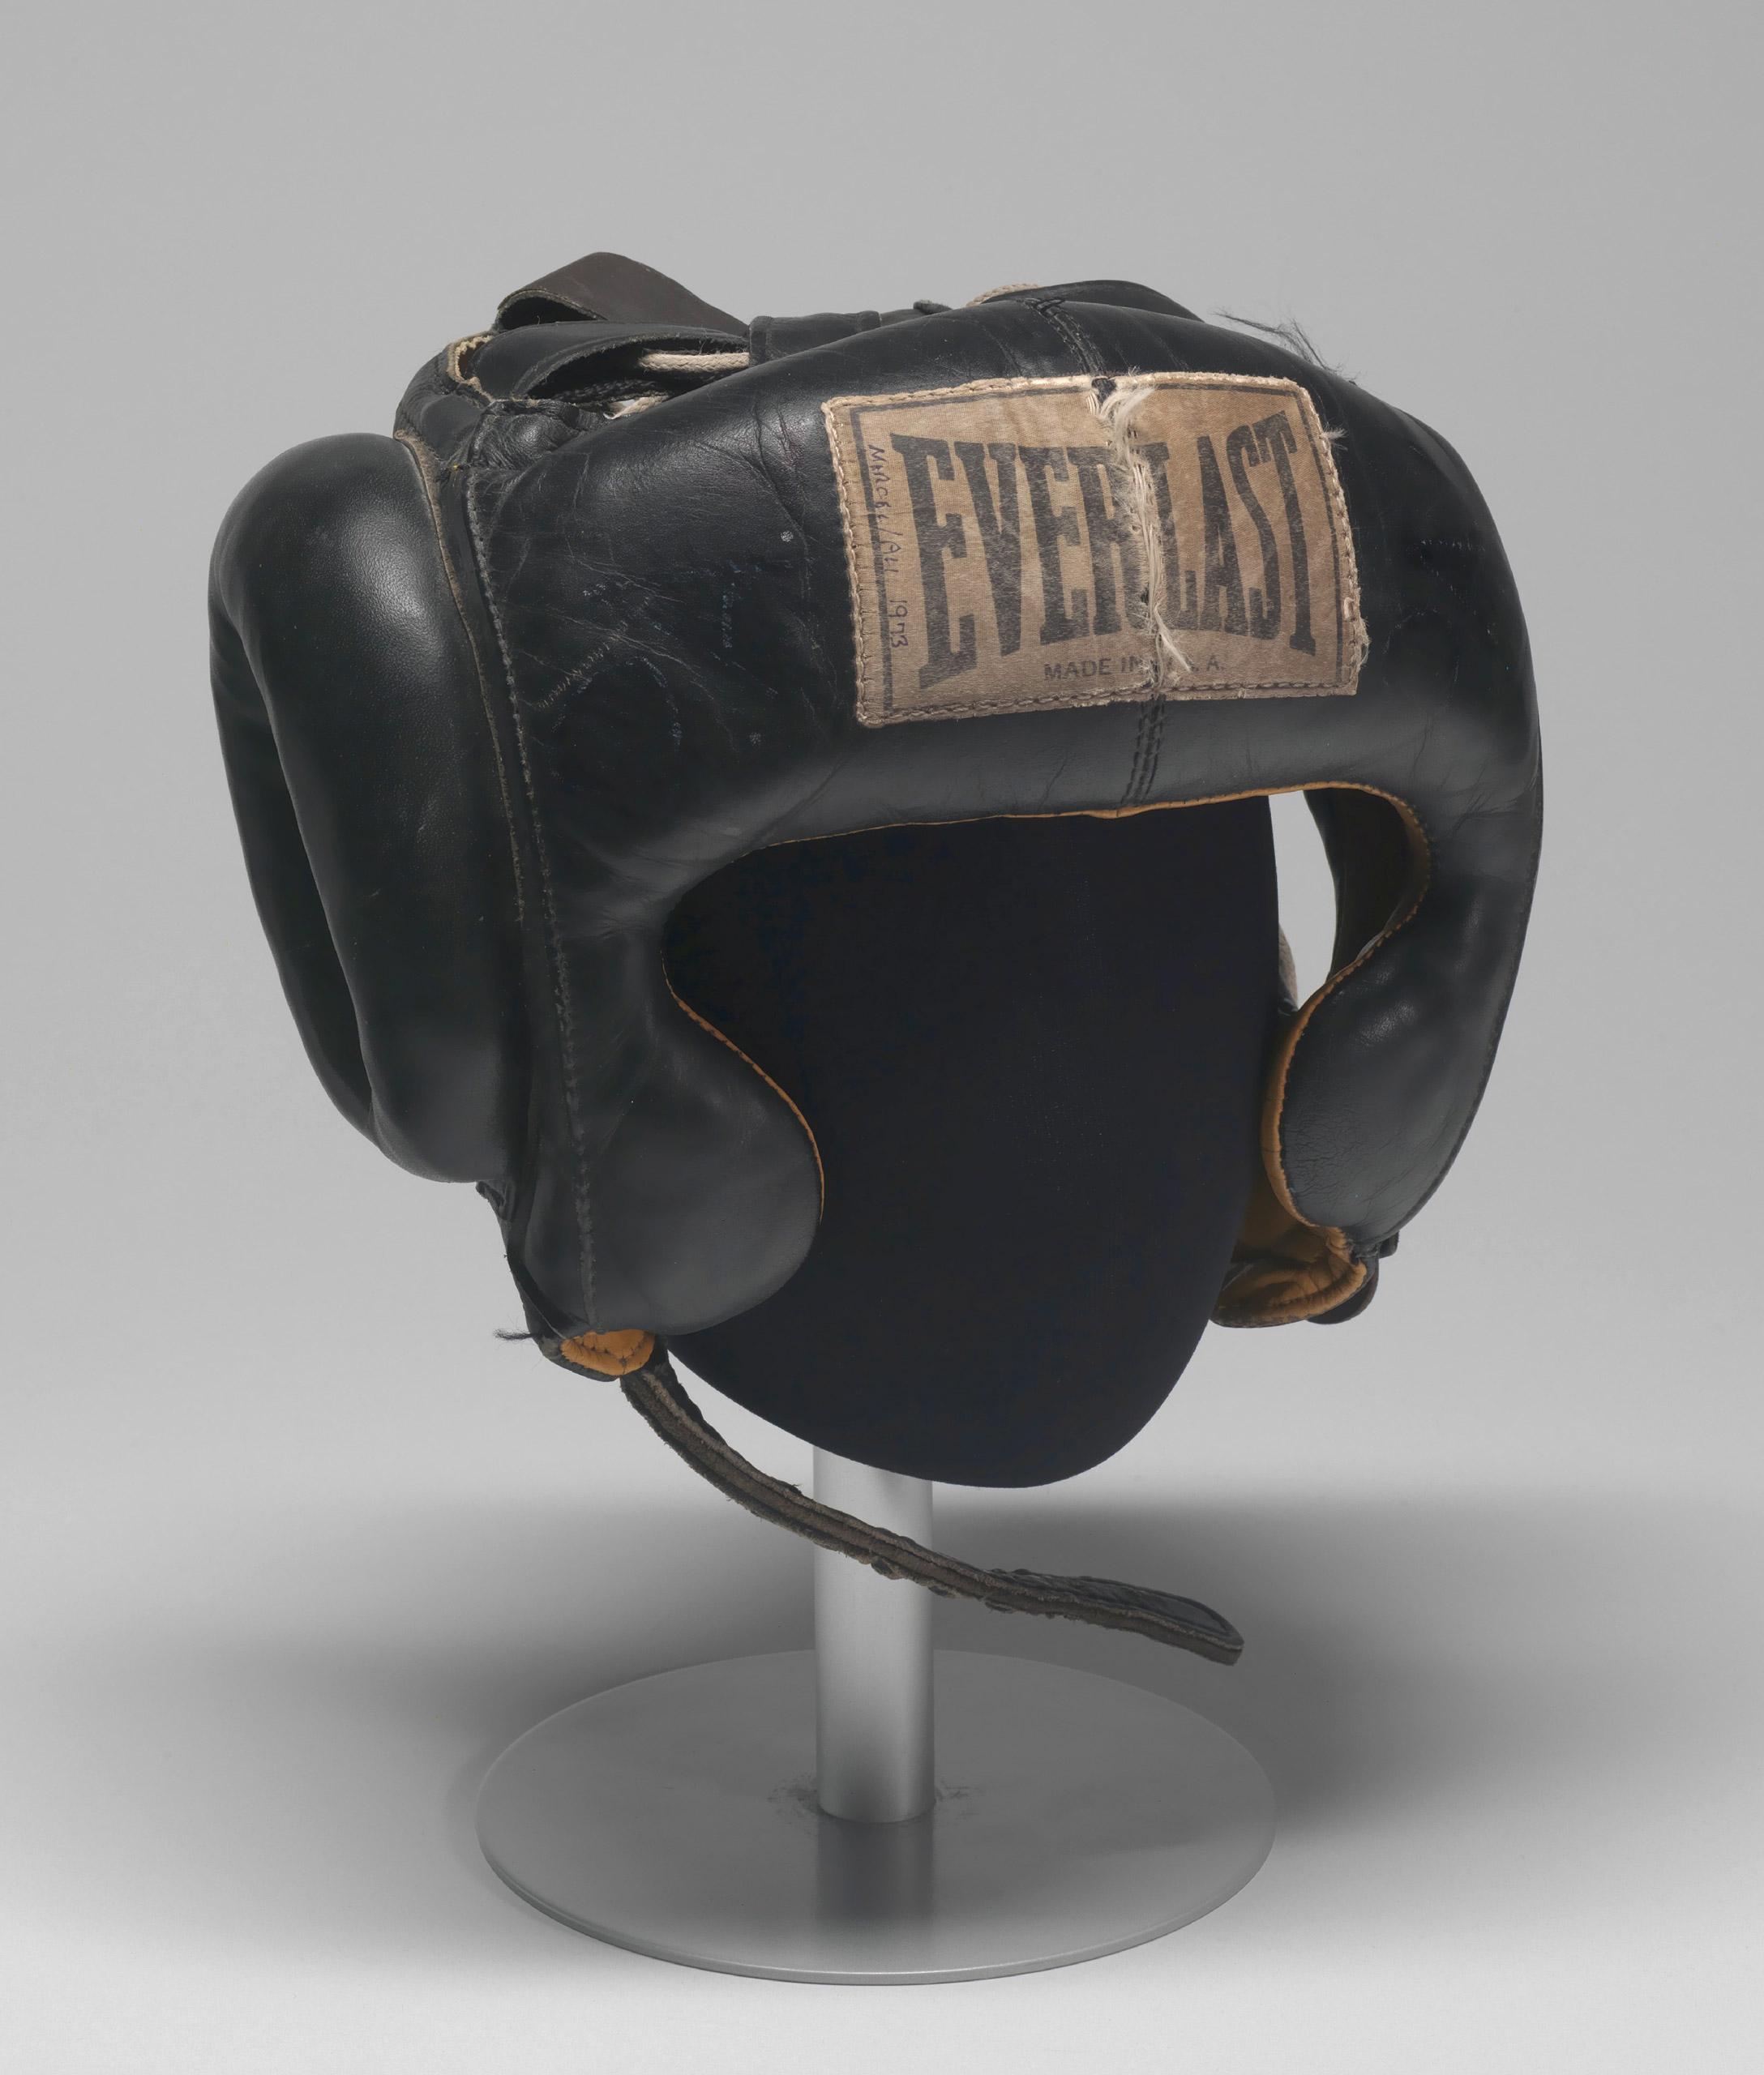 Boxing headgear worn by Muhammad Ali, ca. 1973.